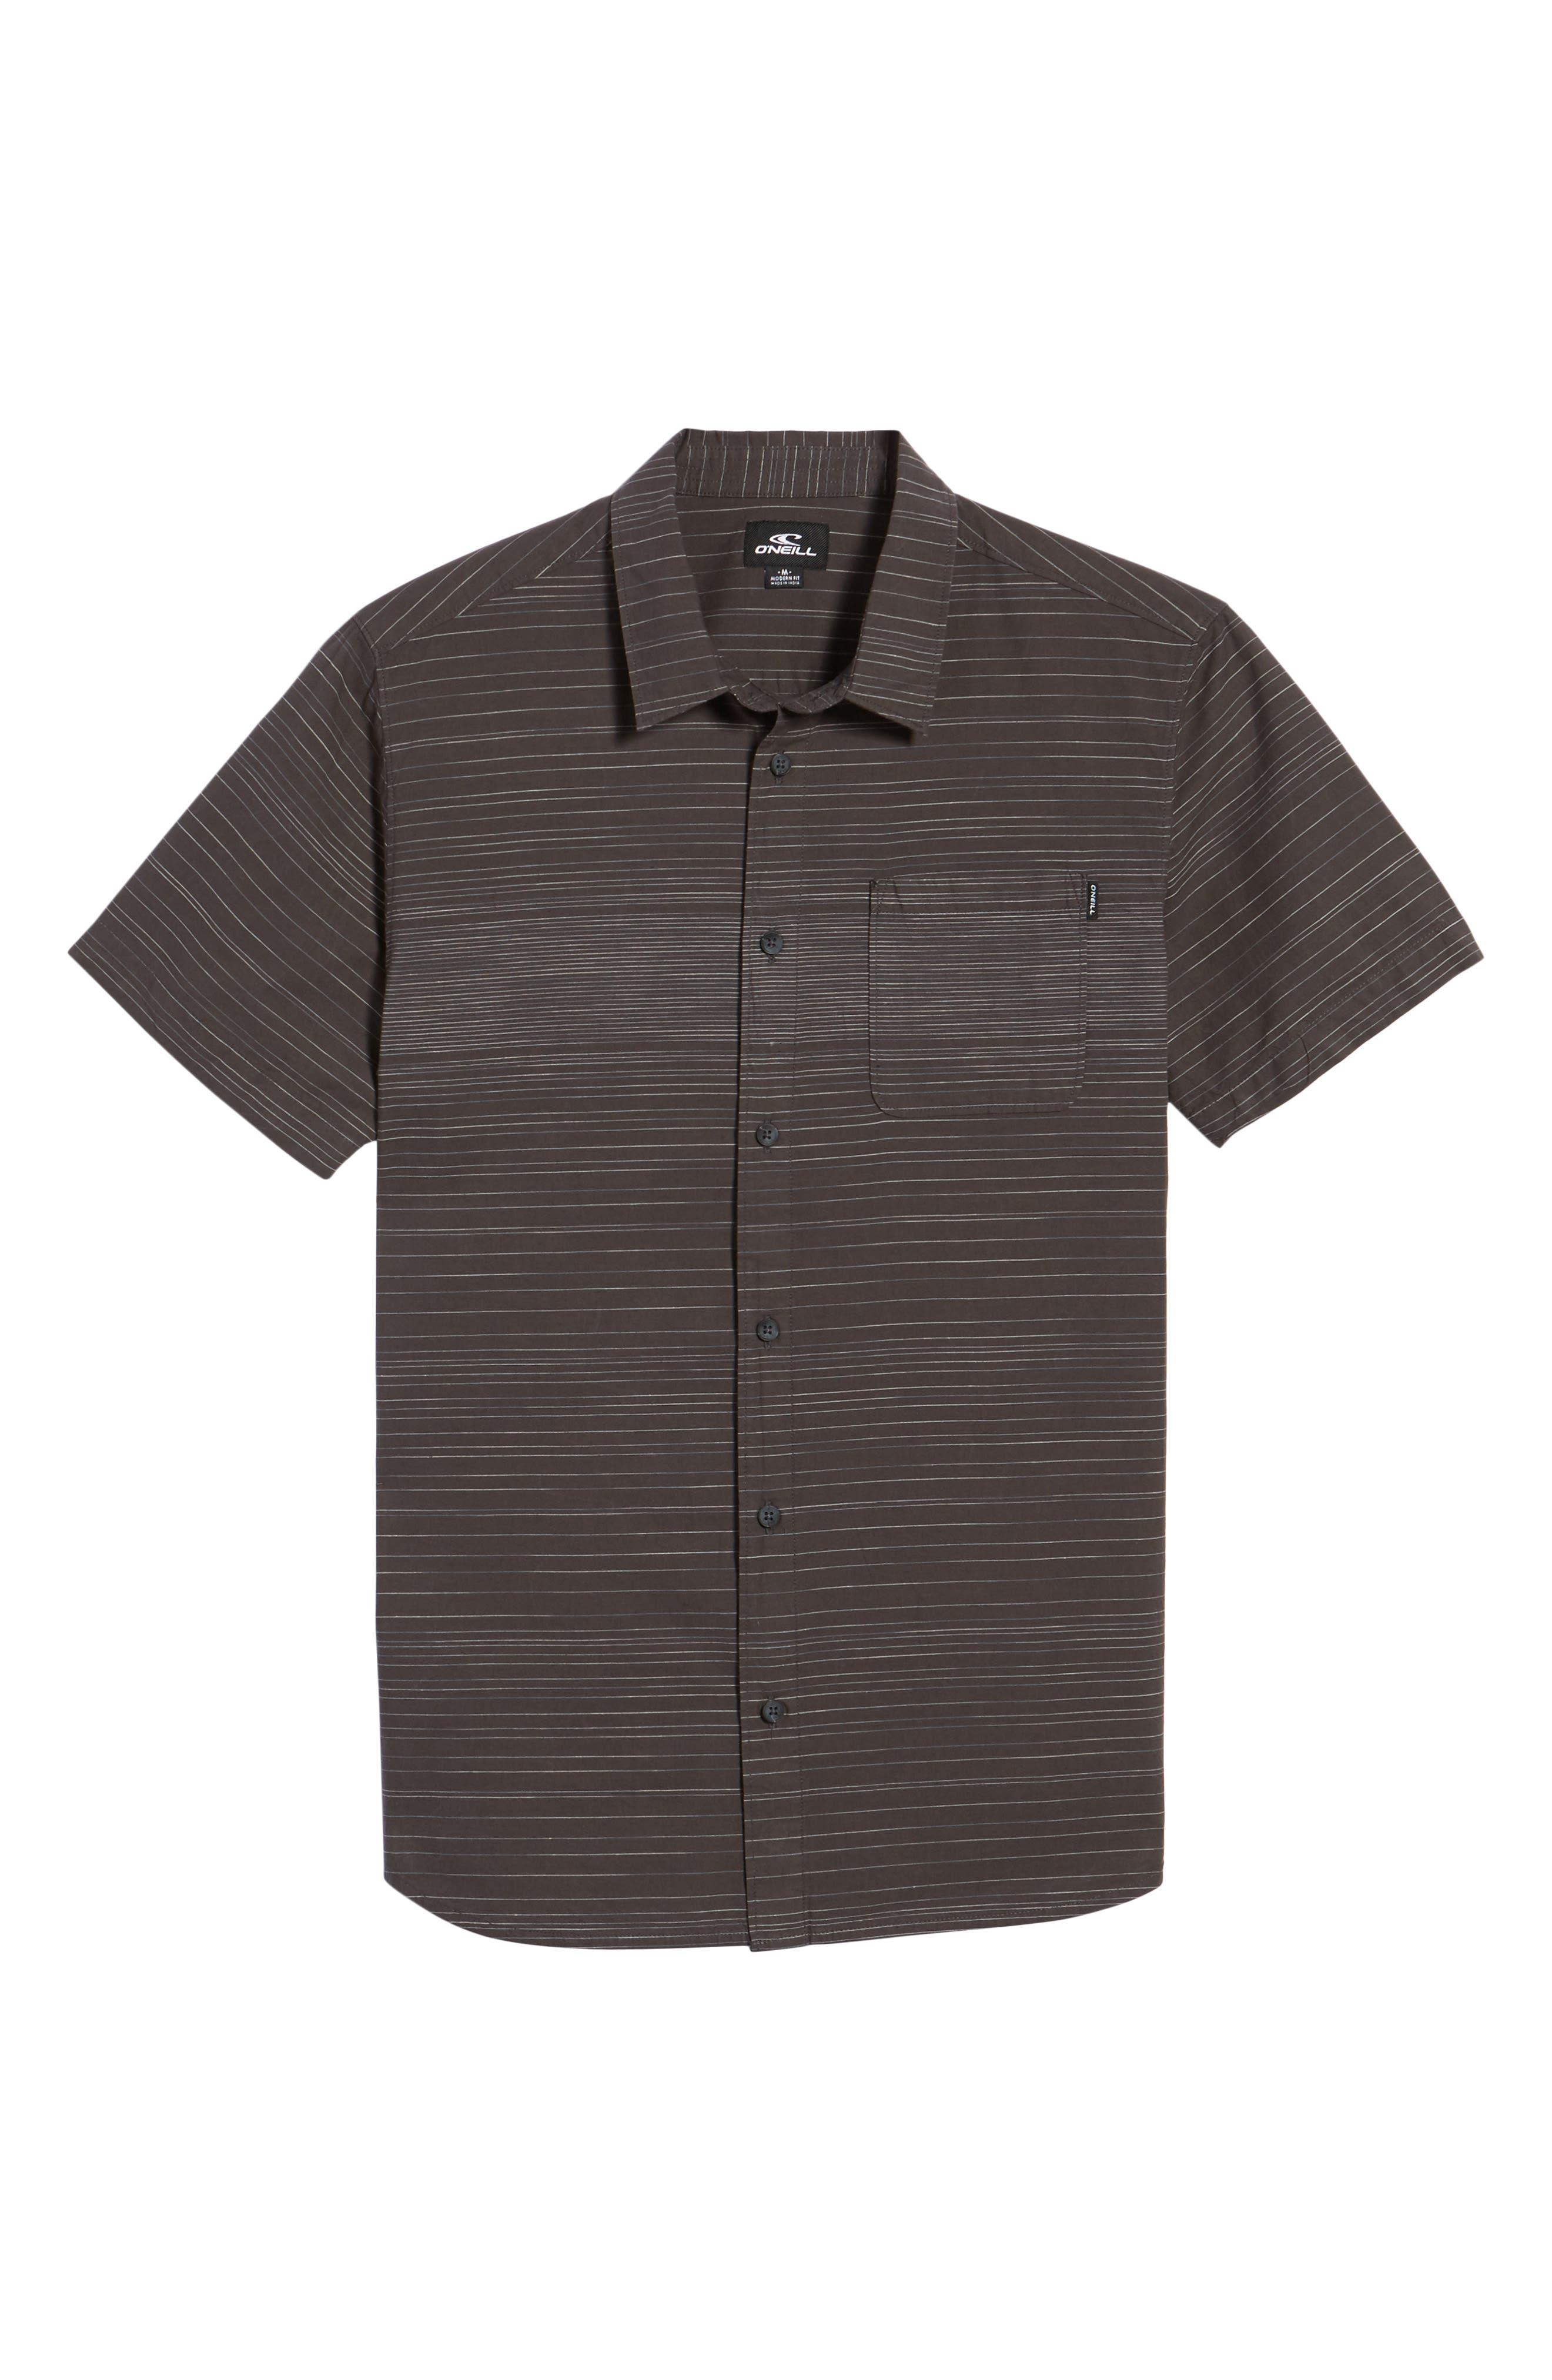 Hound Woven Shirt,                             Alternate thumbnail 6, color,                             Asphalt